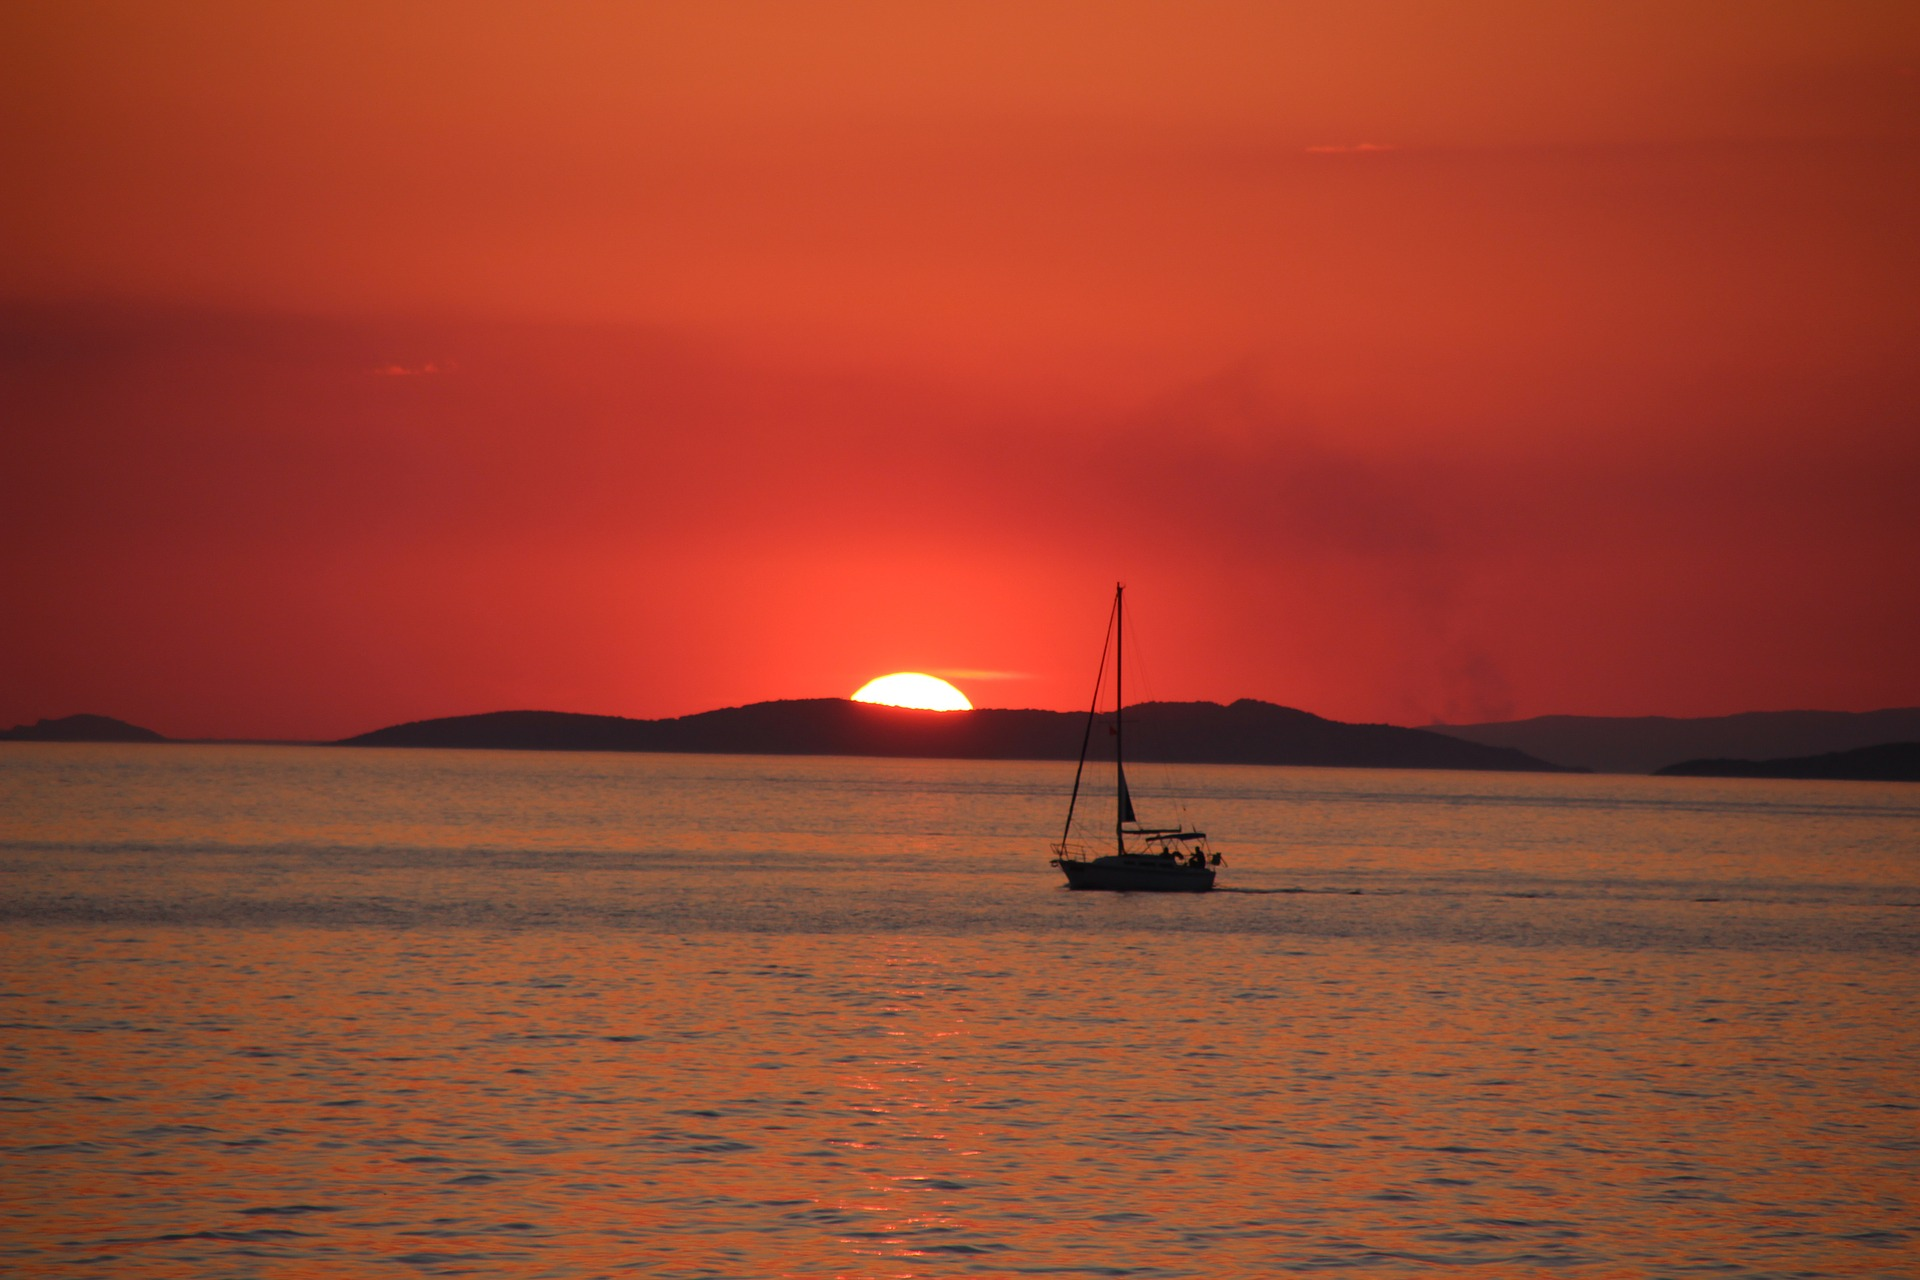 sunset-1438227_1920